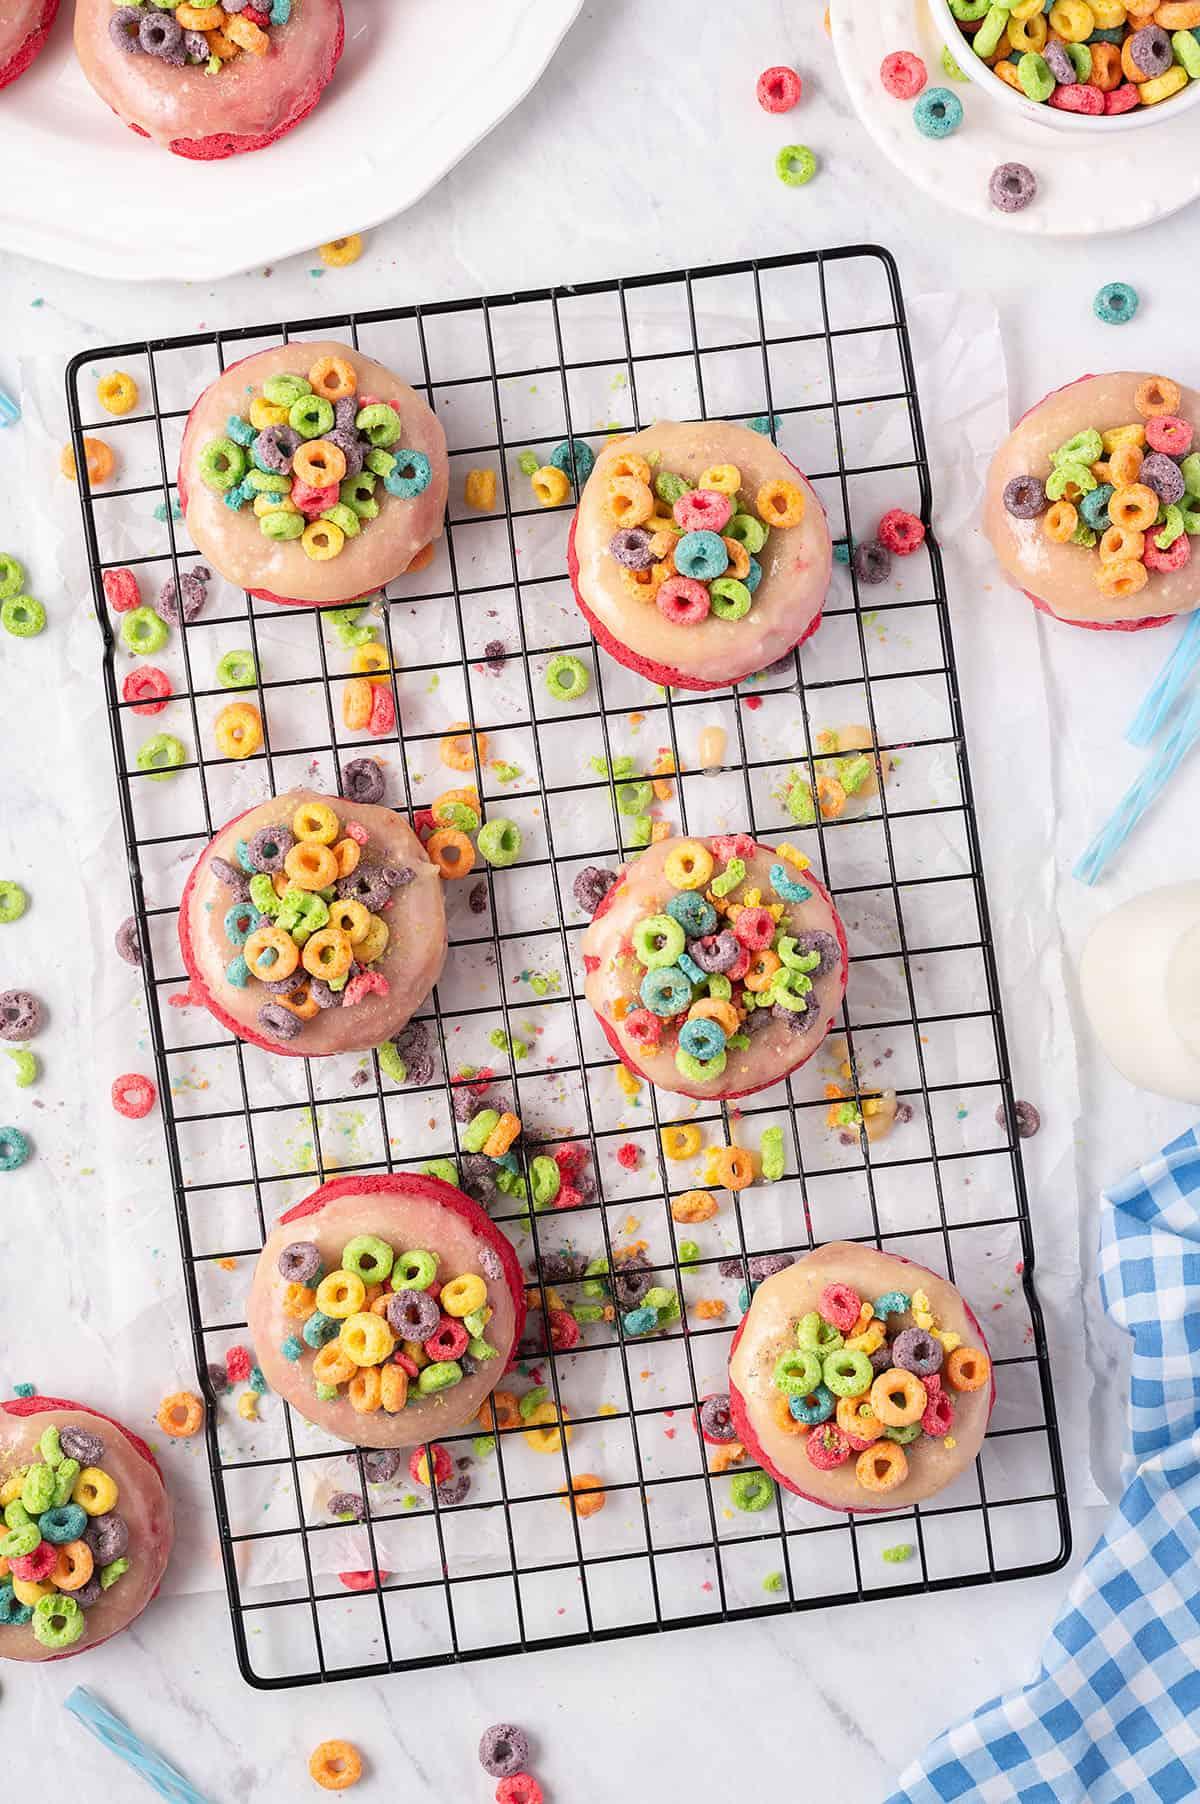 glazed donuts on cooling rack.